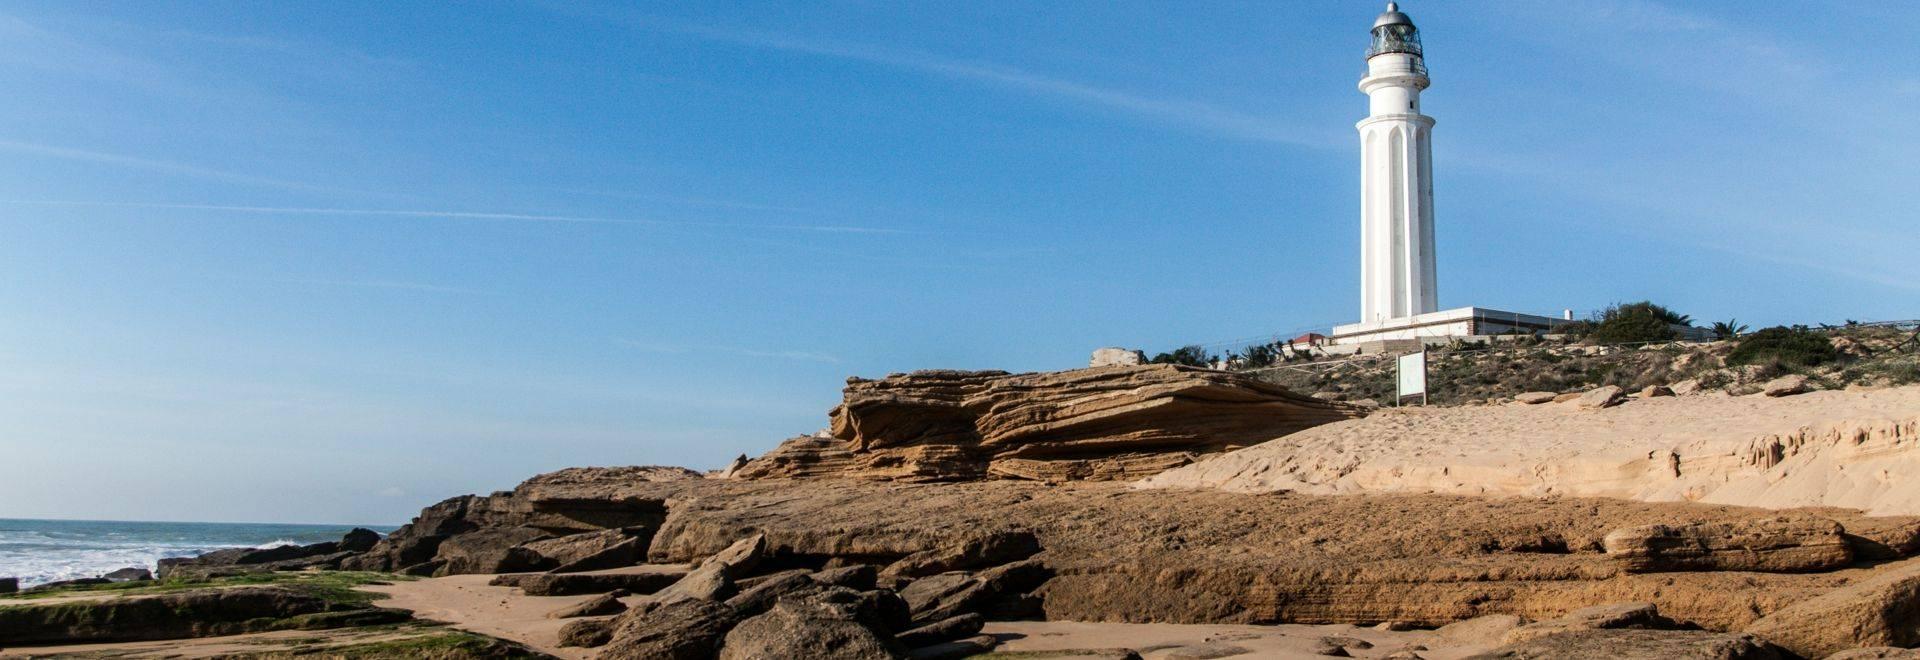 Shutterstock 127932440 Cape Trafalgar